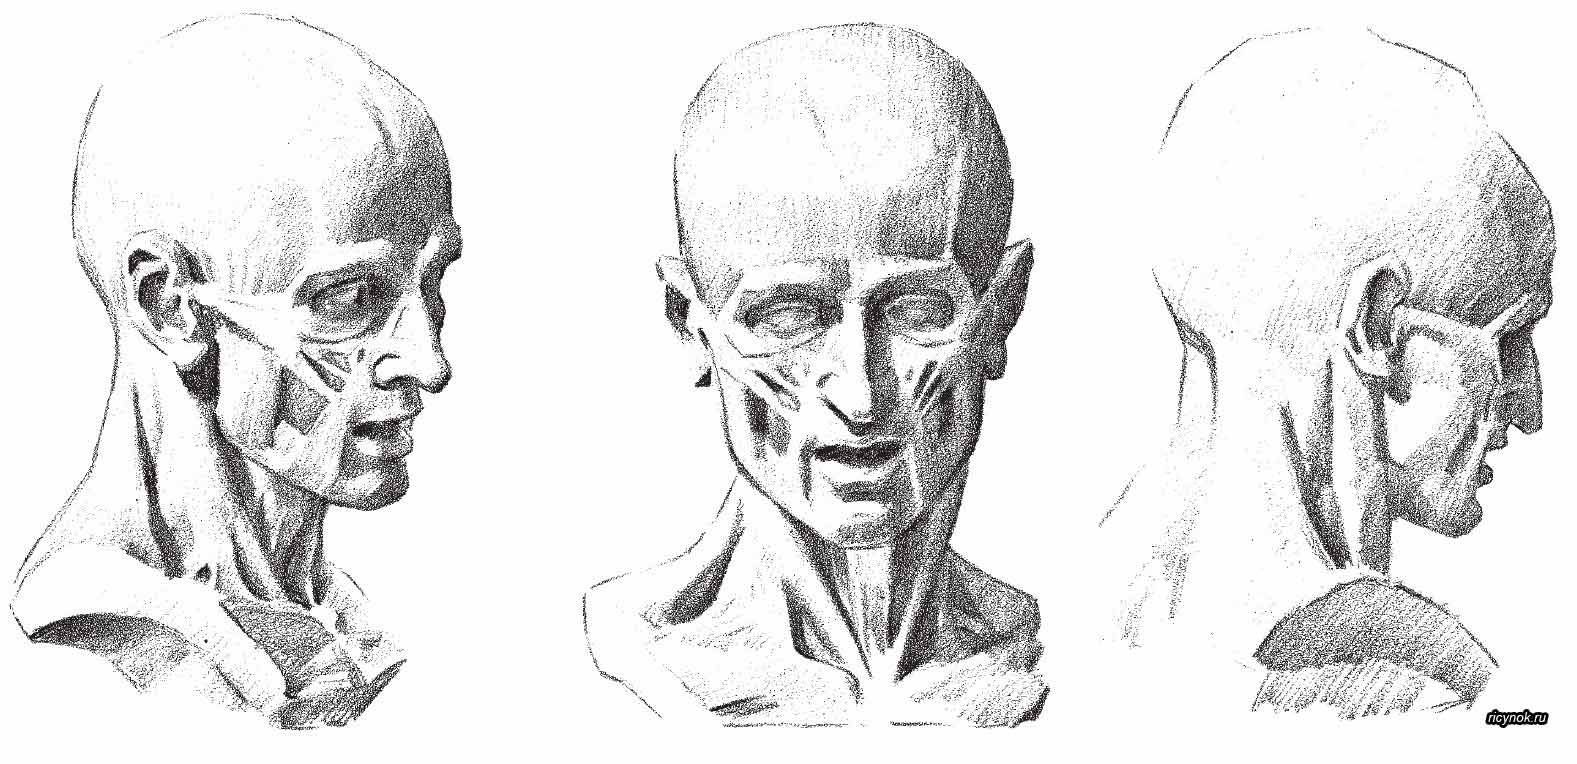 Pin by Stas Snezhkov on анатомия головы   Pinterest   Anatomy ...